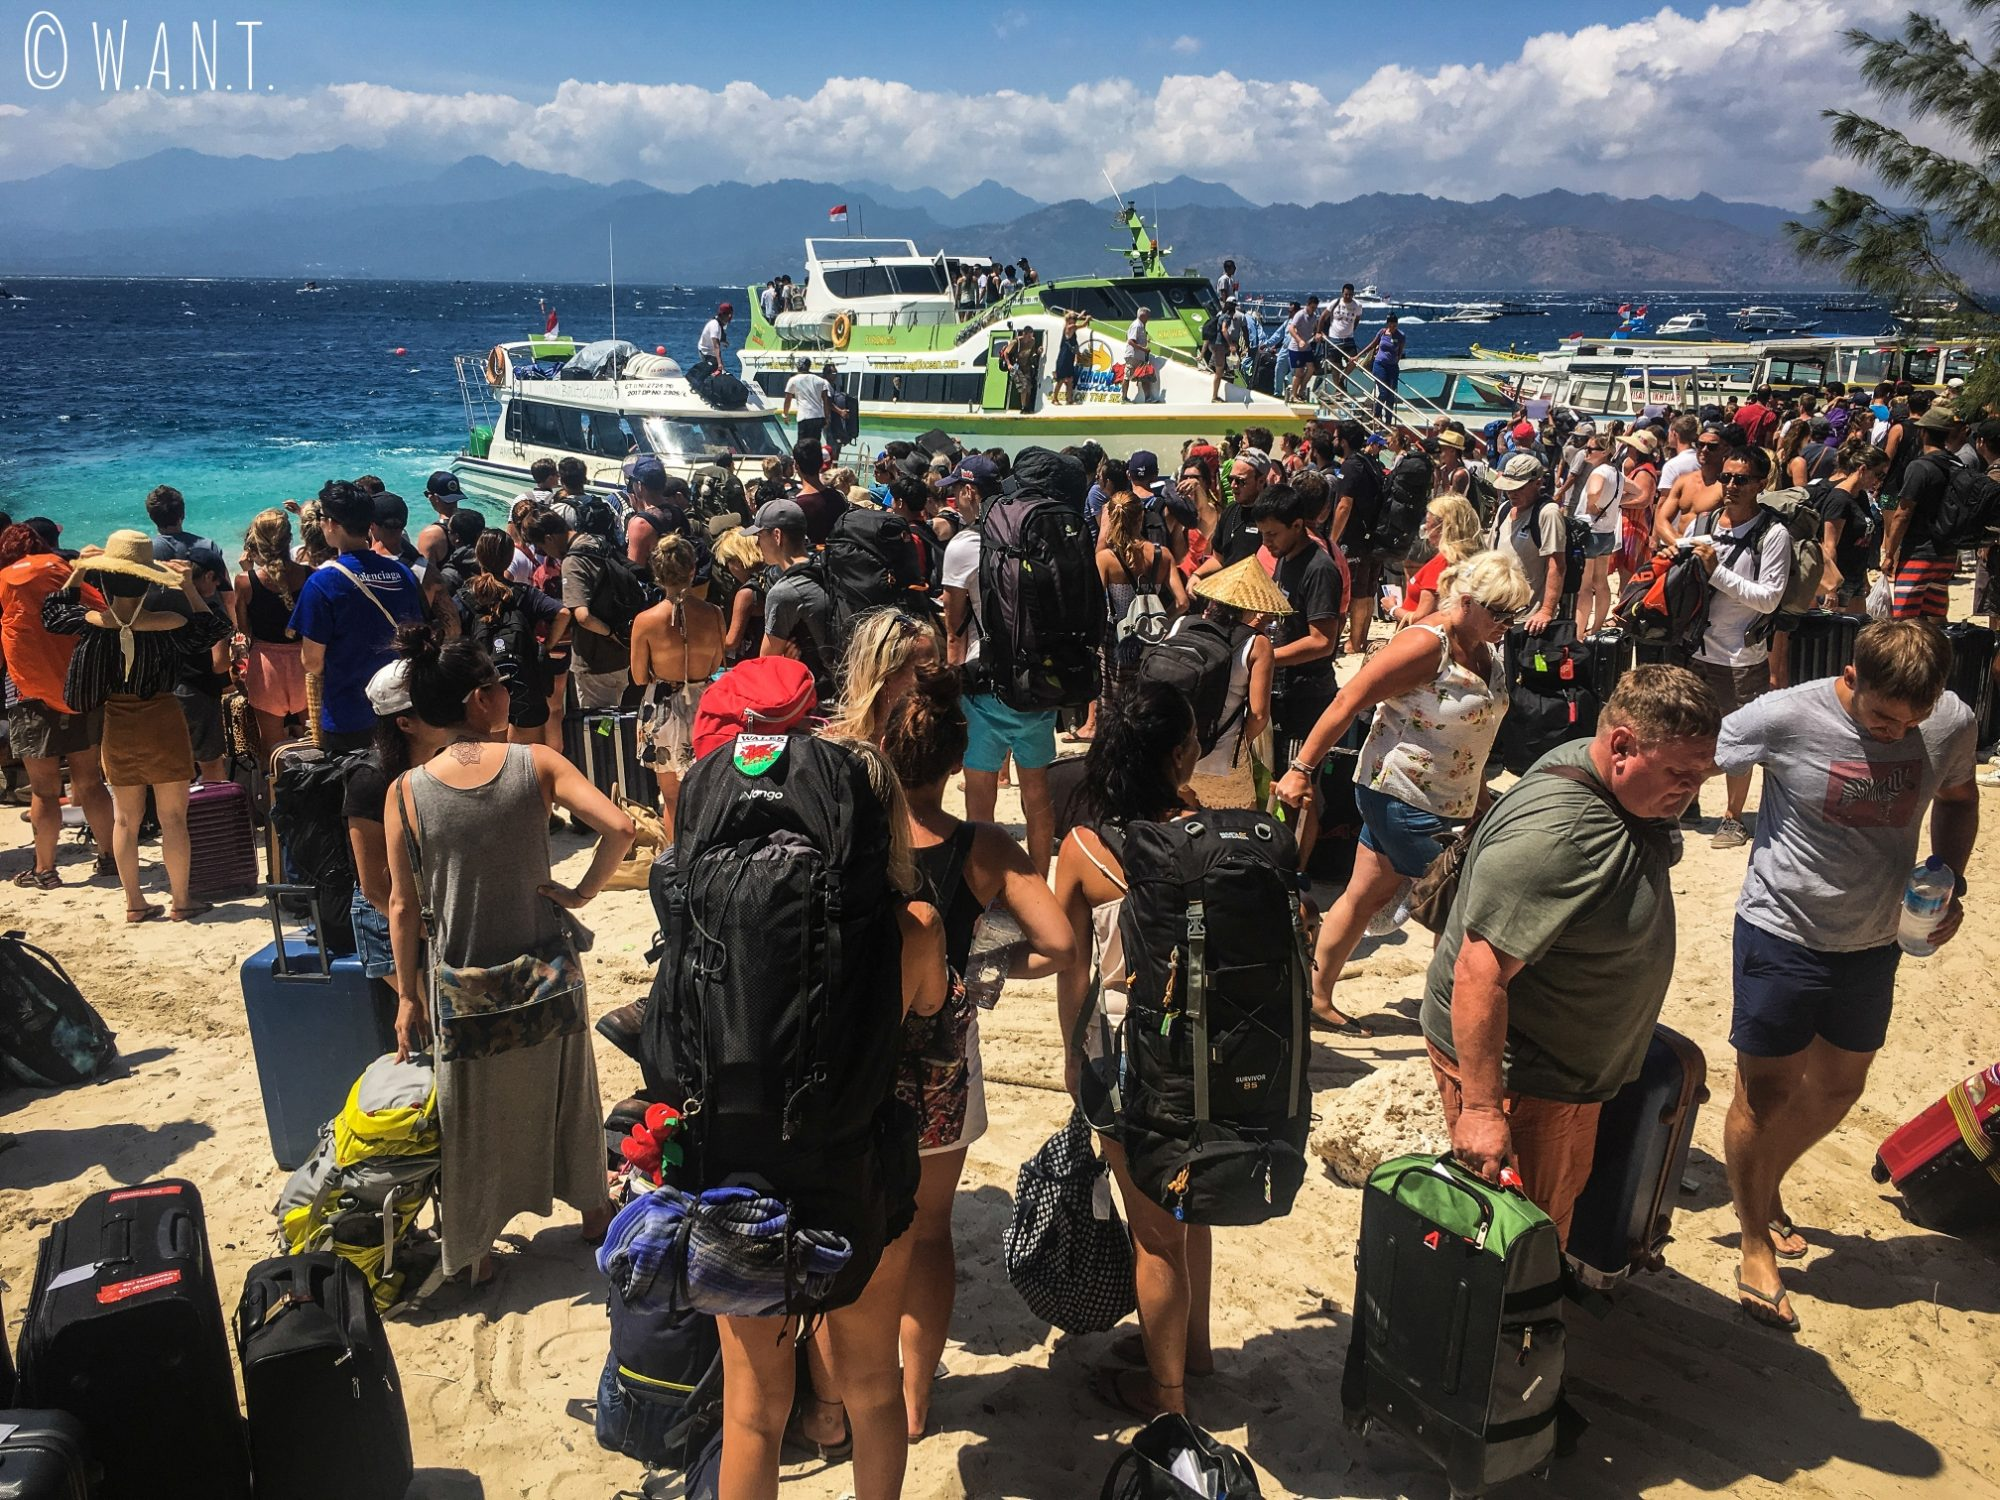 Foule à l'embarcadère des speedboats sur Gili Trawagan